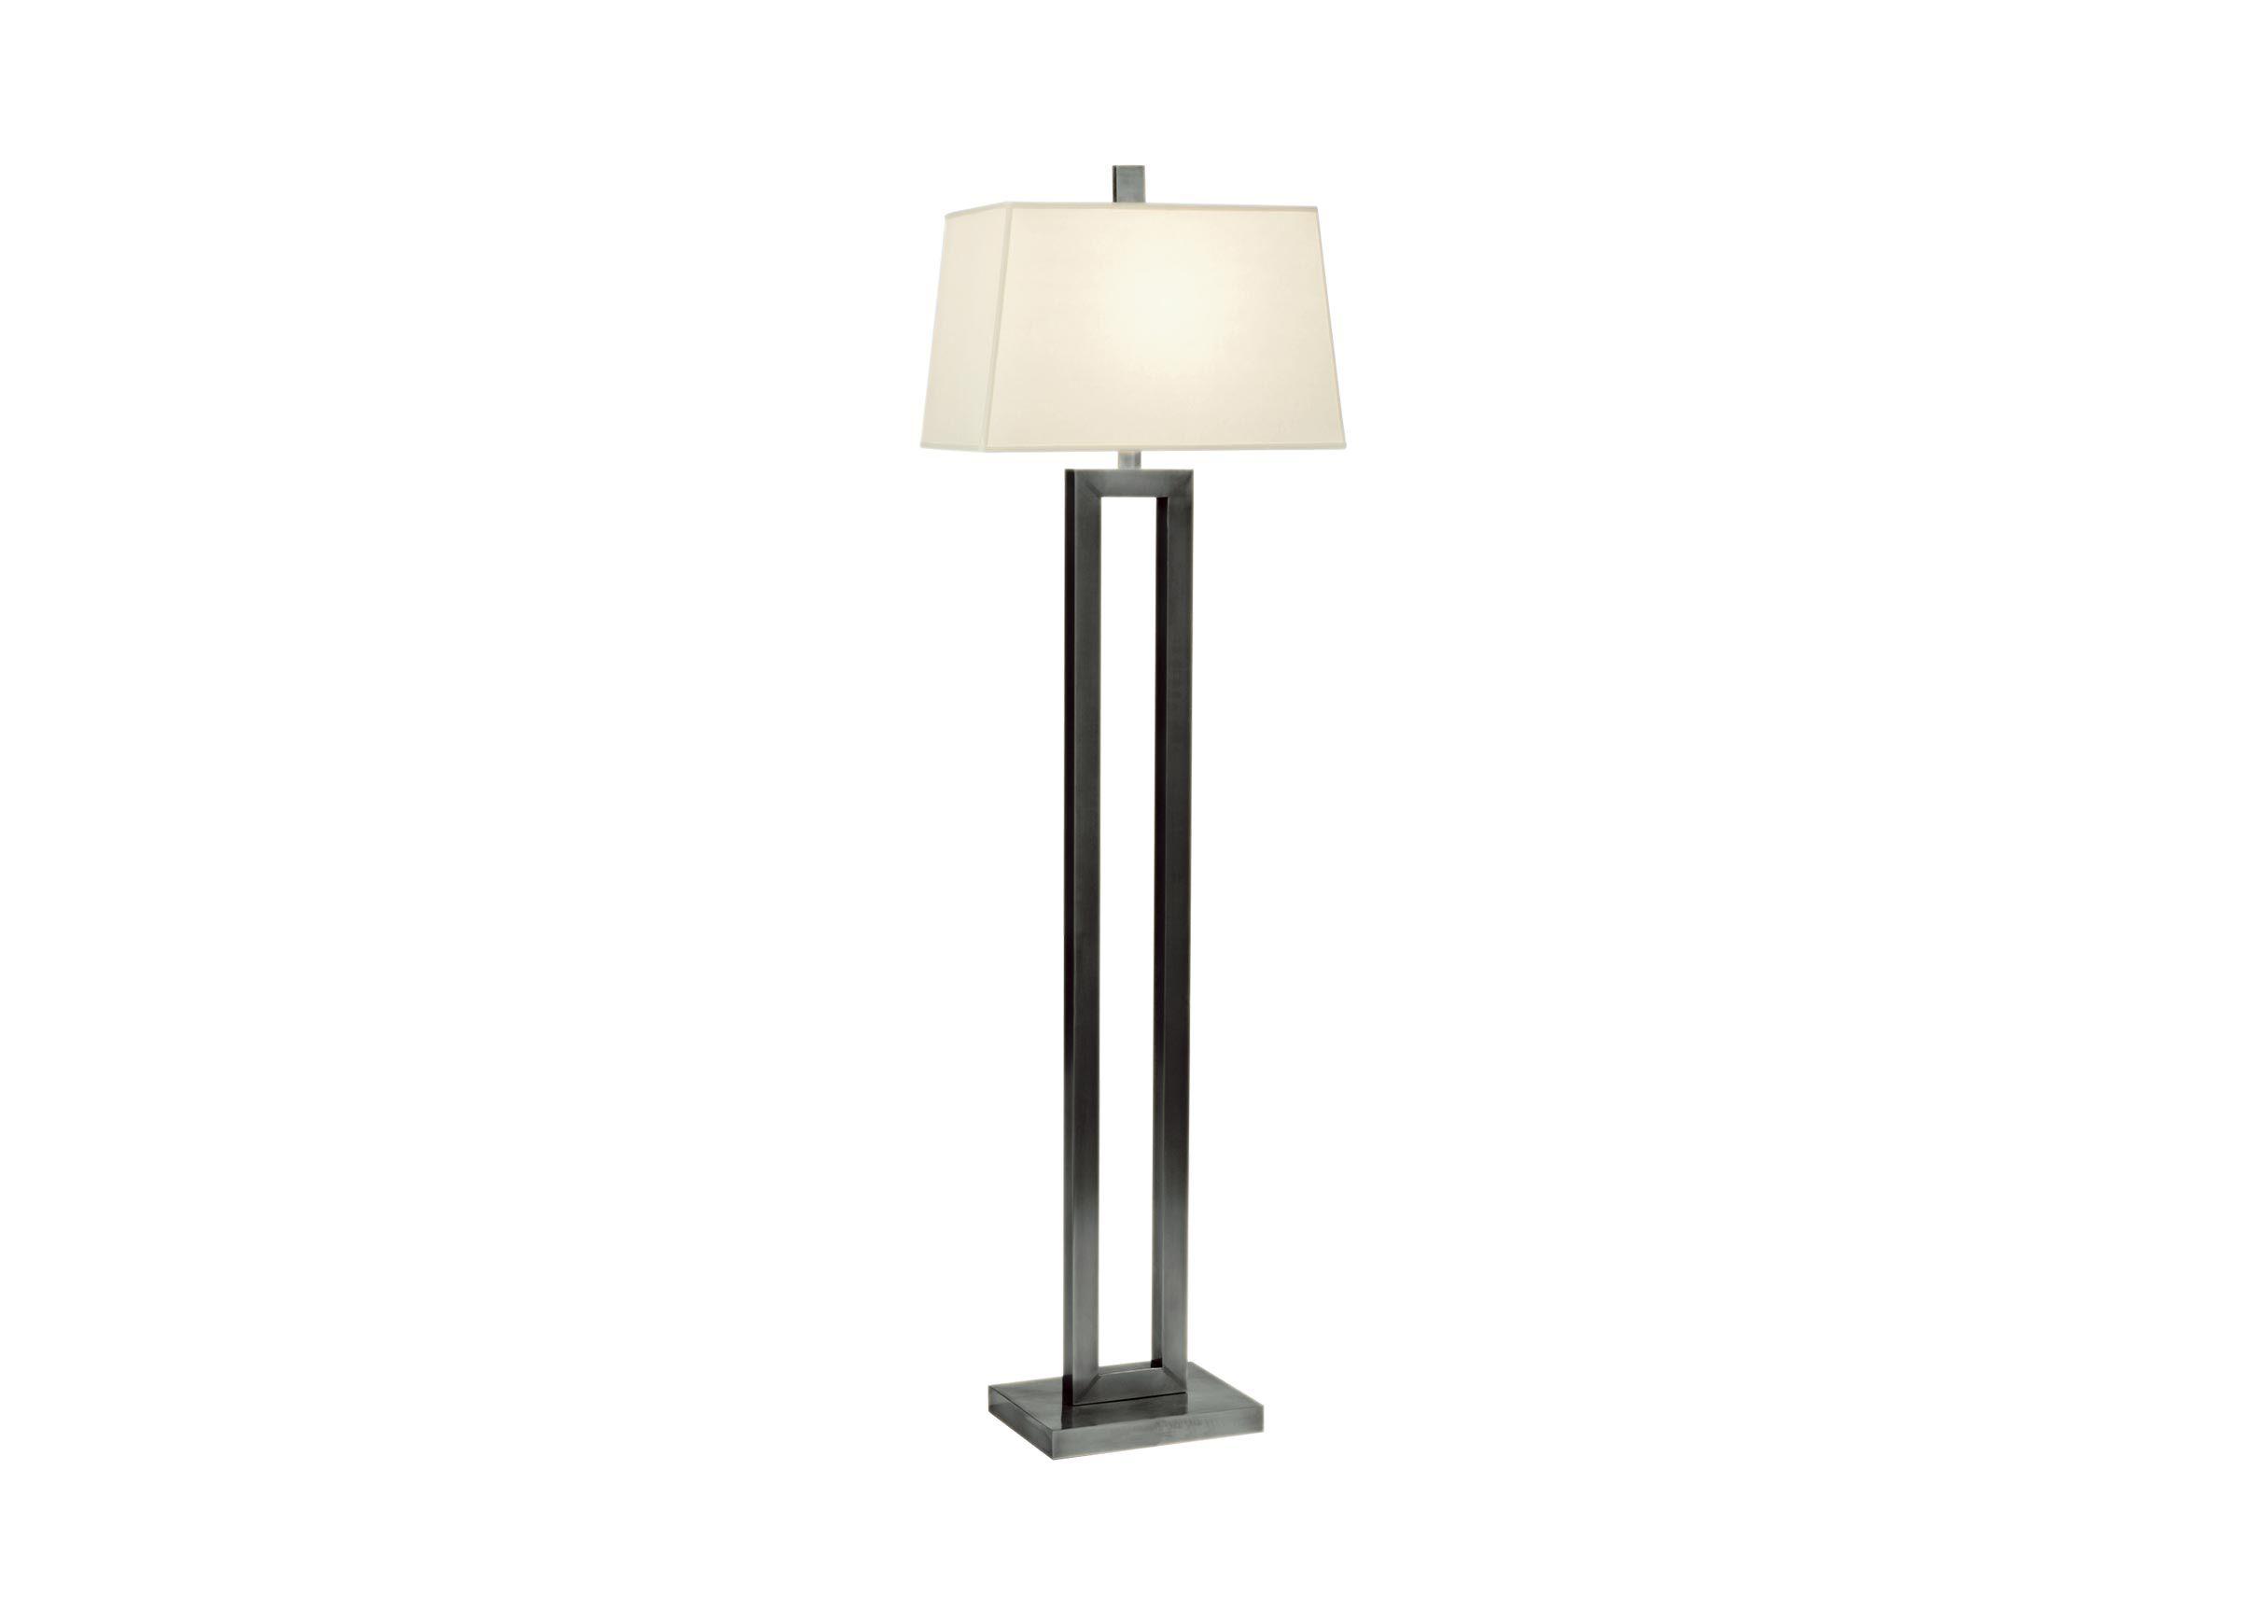 stafford bronze floor lamp at ethan allen in somerville nj tuggl